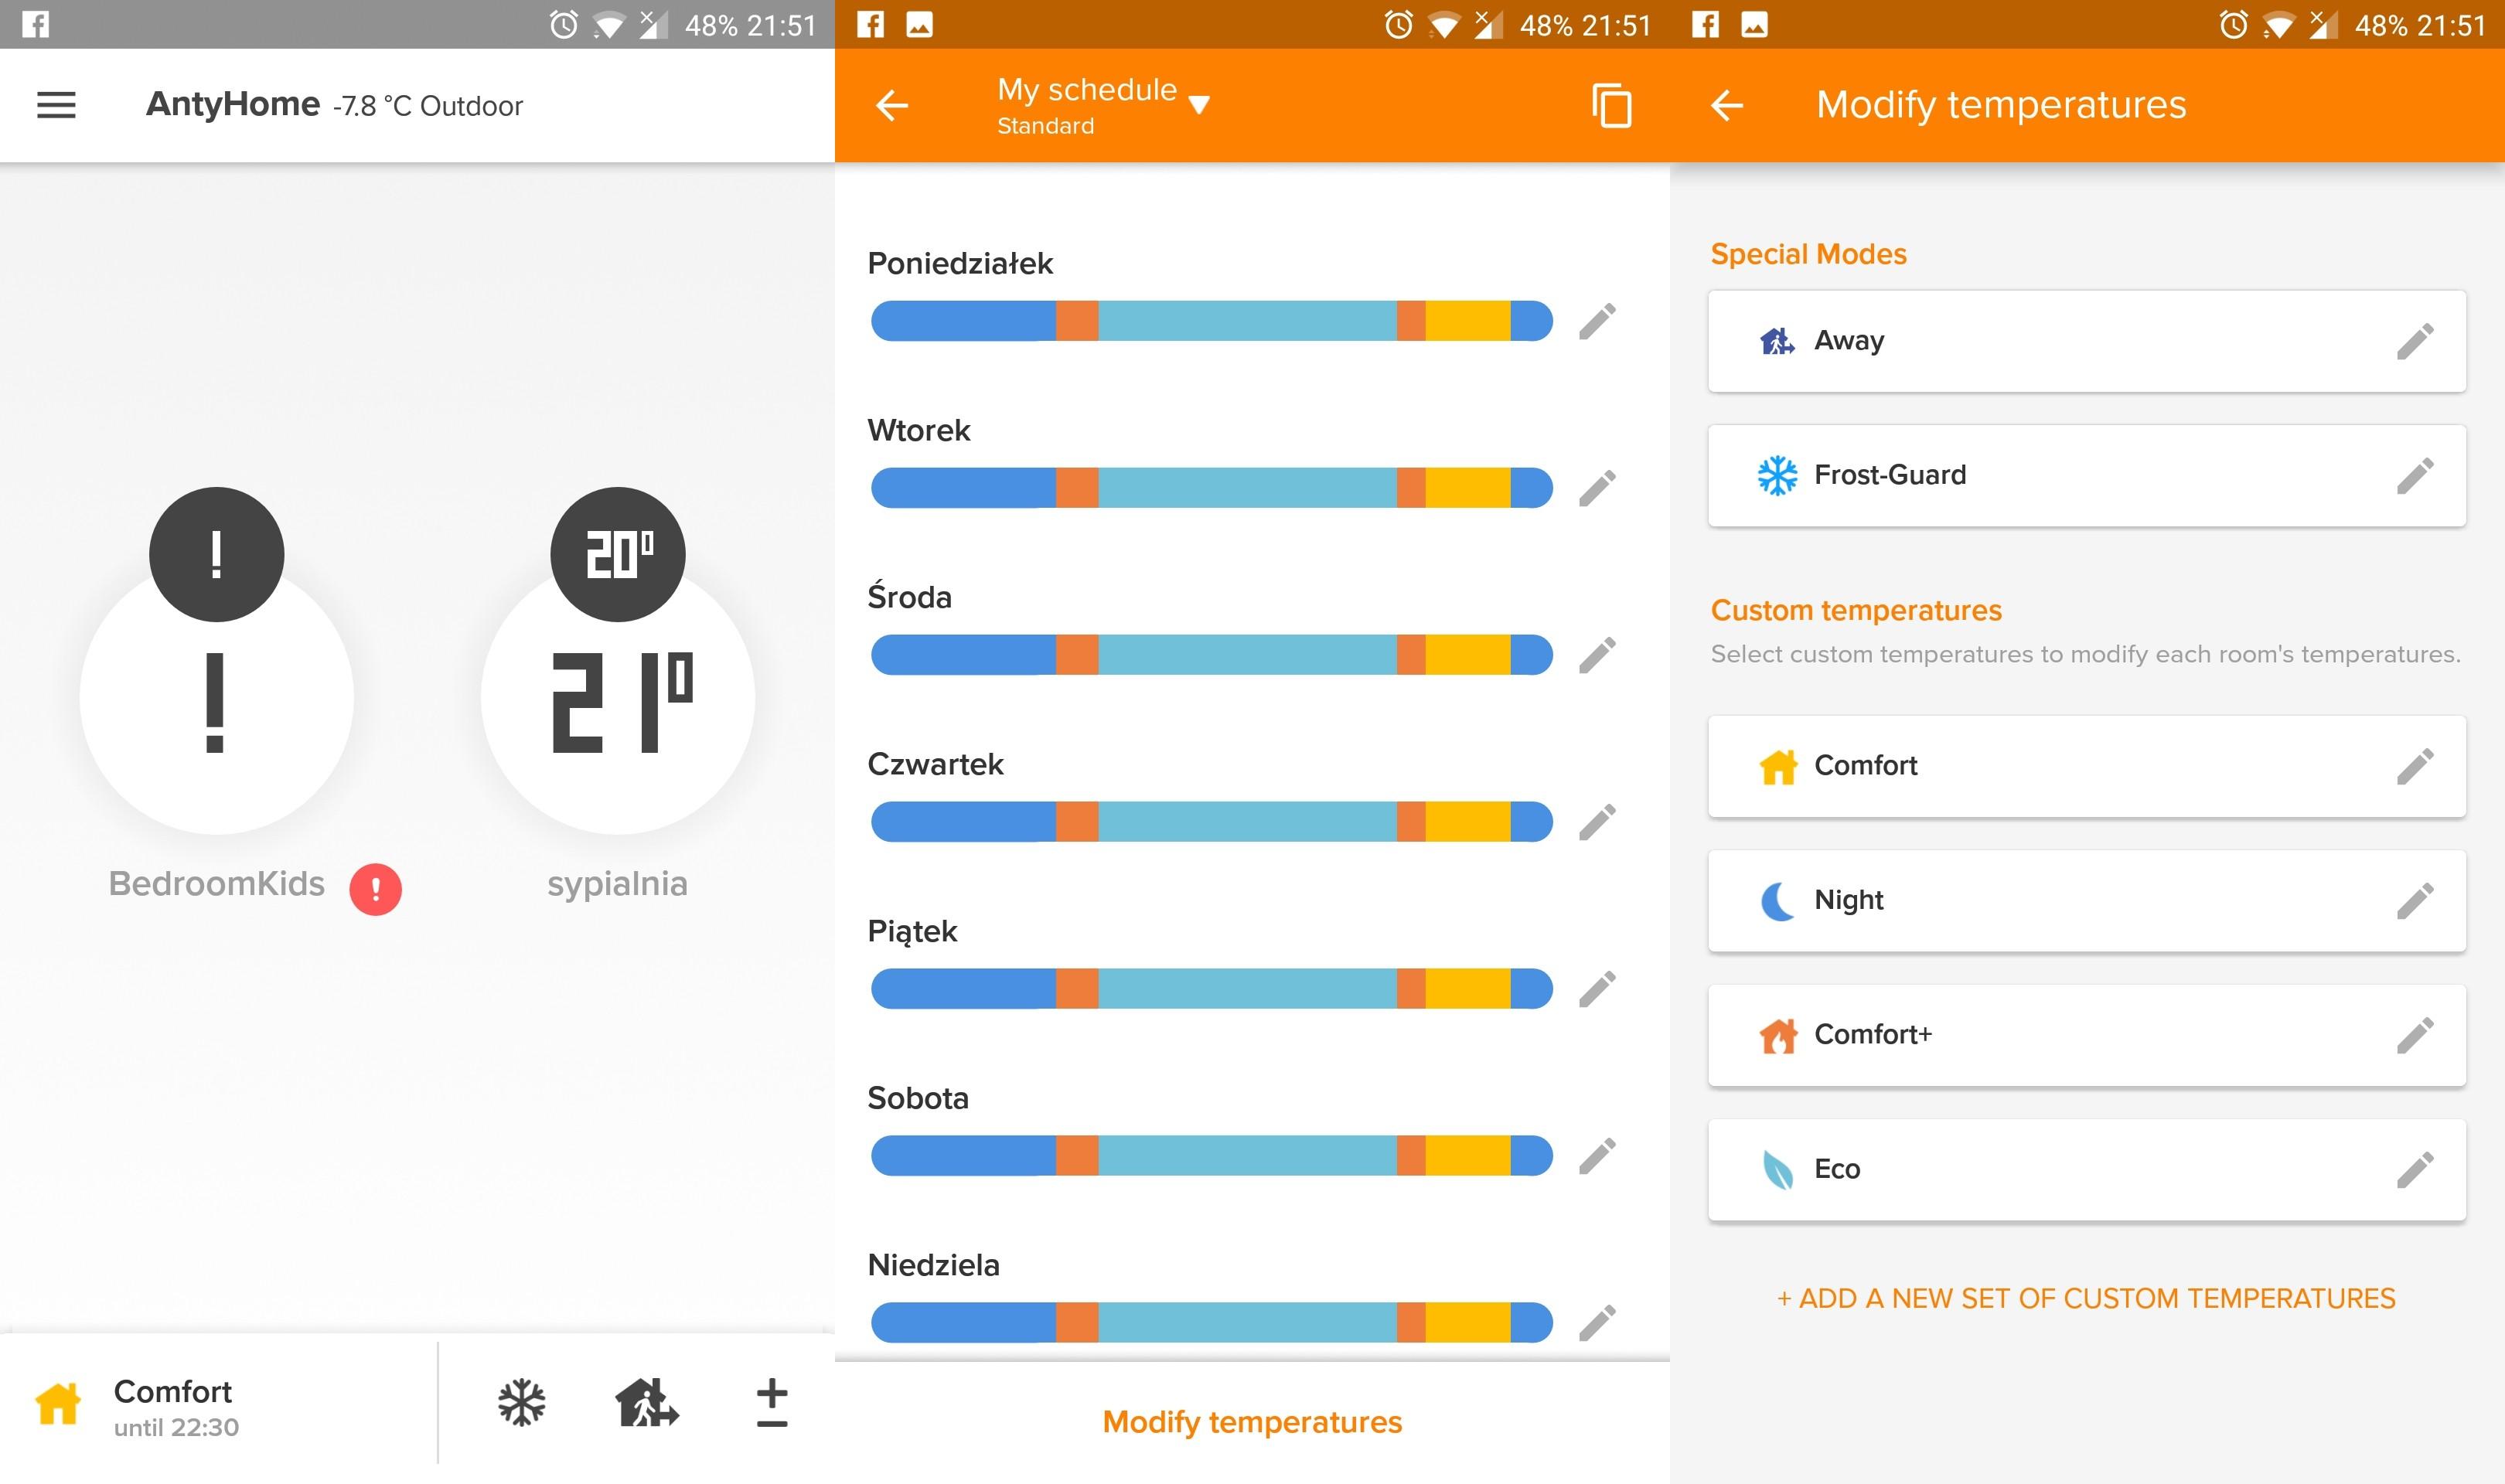 Termostat inteligentny Netatmo Valves Set aplikacja Energy konfiguracja temperatur